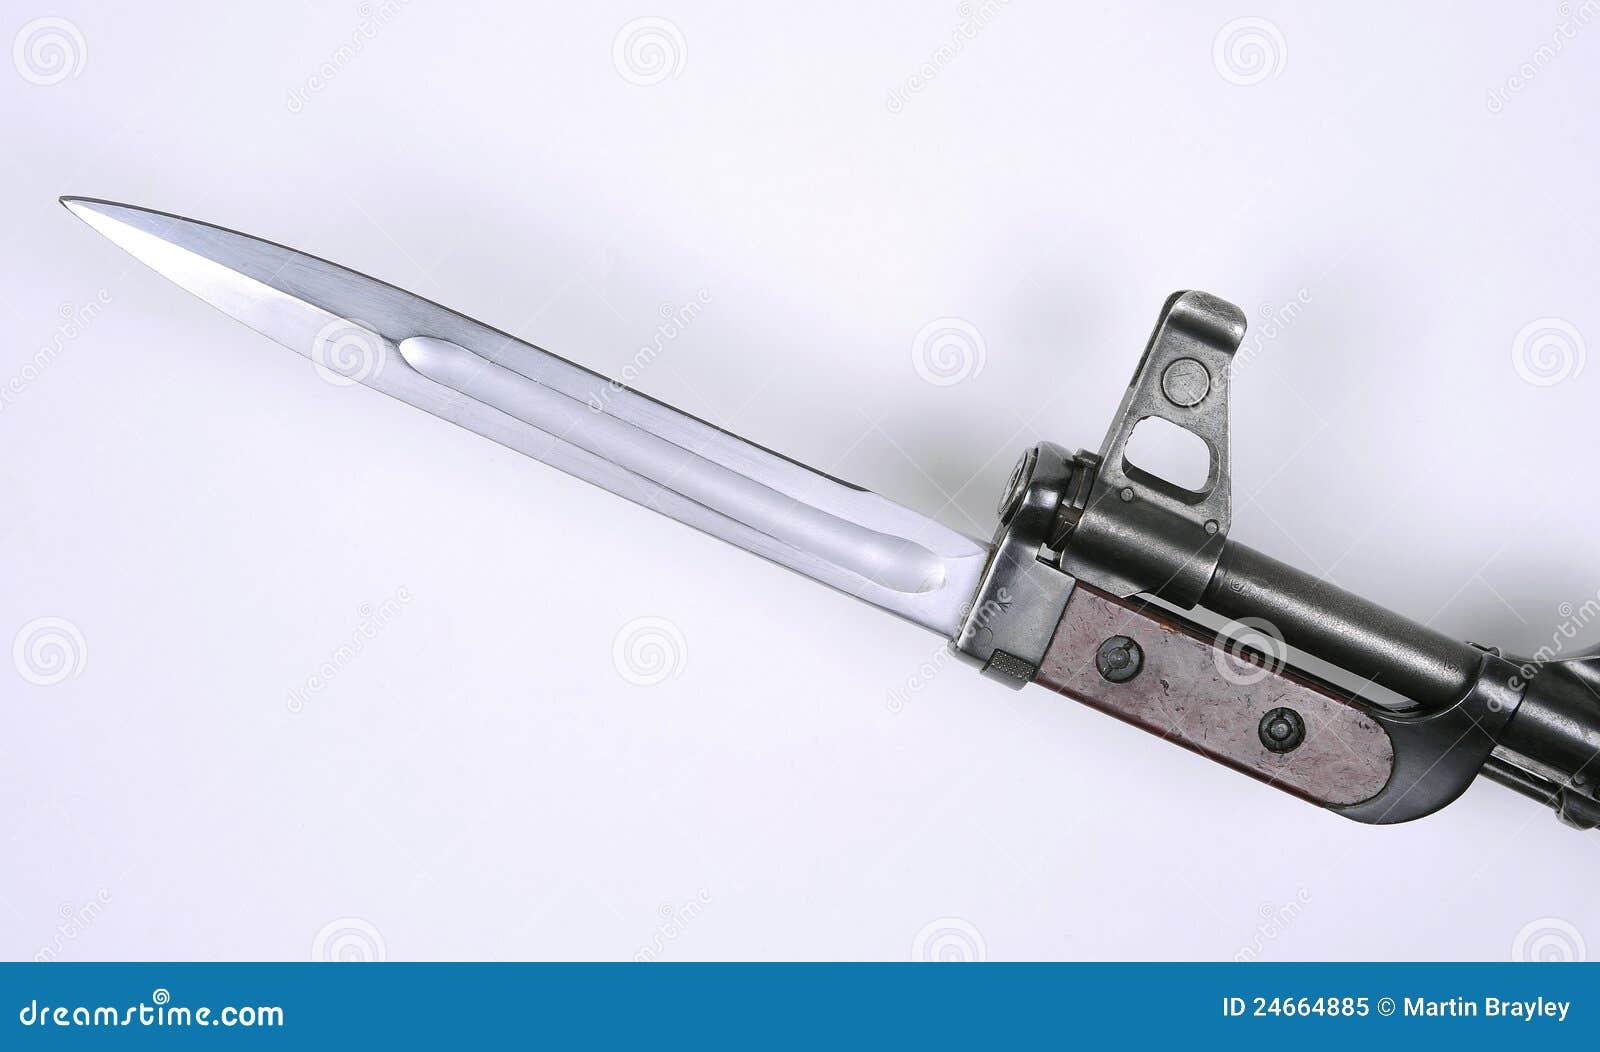 Russian AK47 bayonet